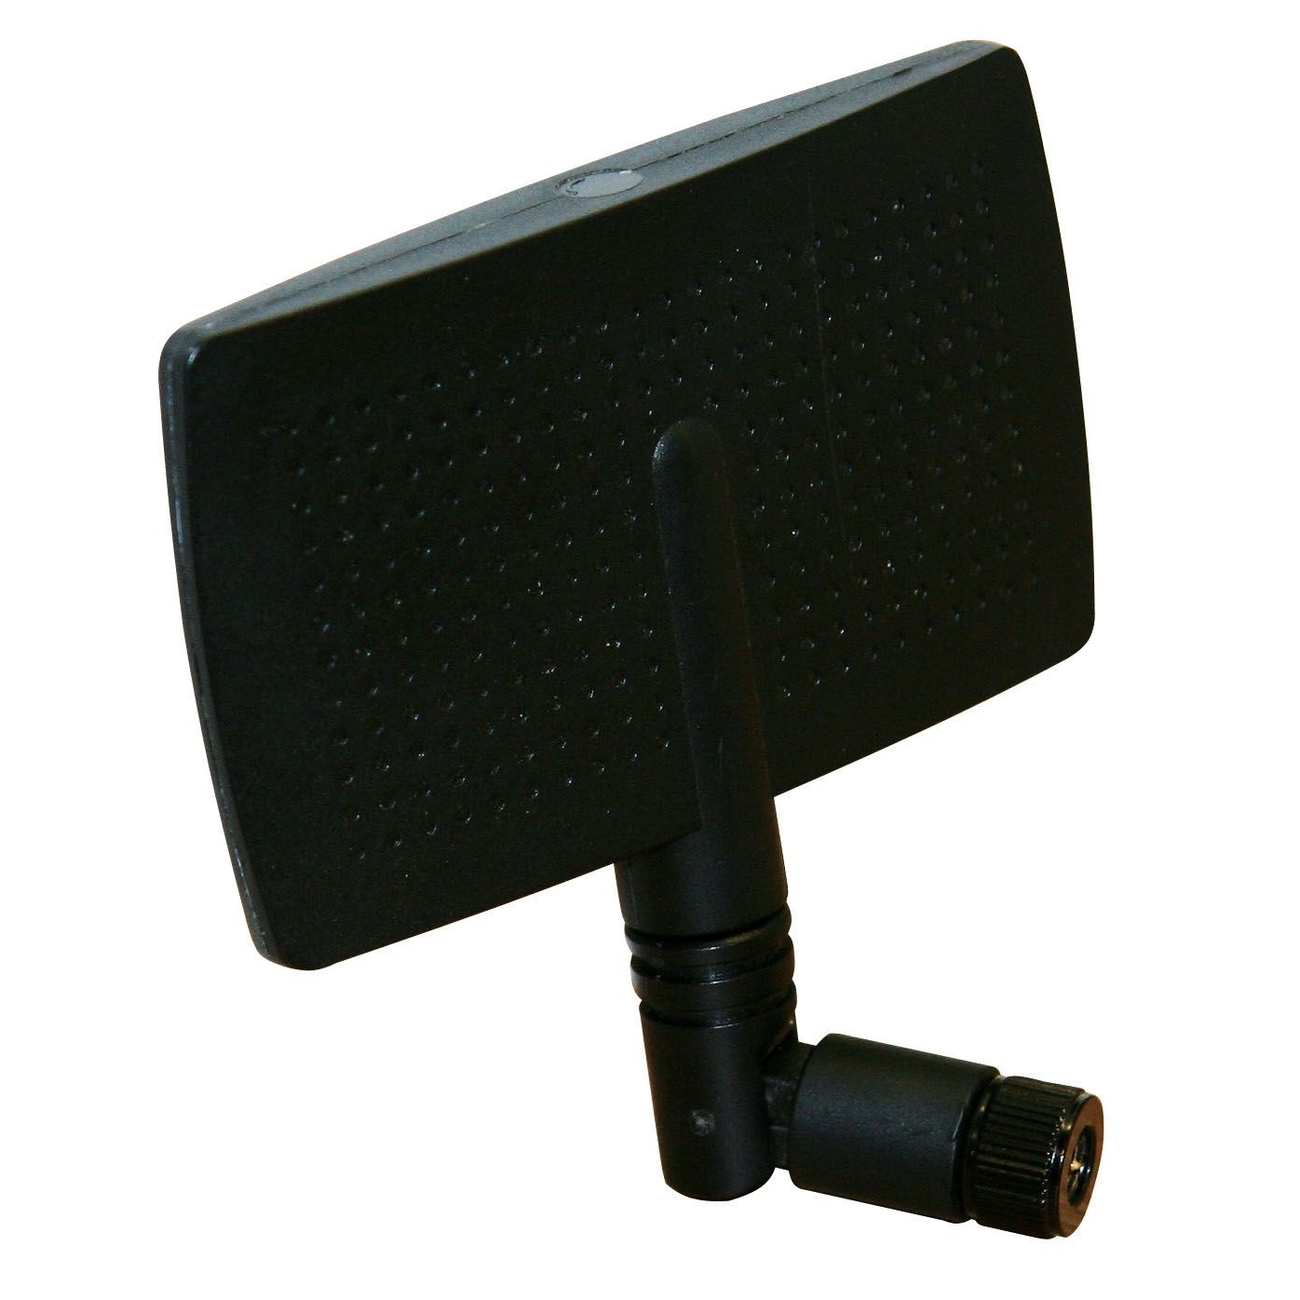 Kerbl Stallkameraset Anhängerkameraset 2,4 GHz, Bild 9